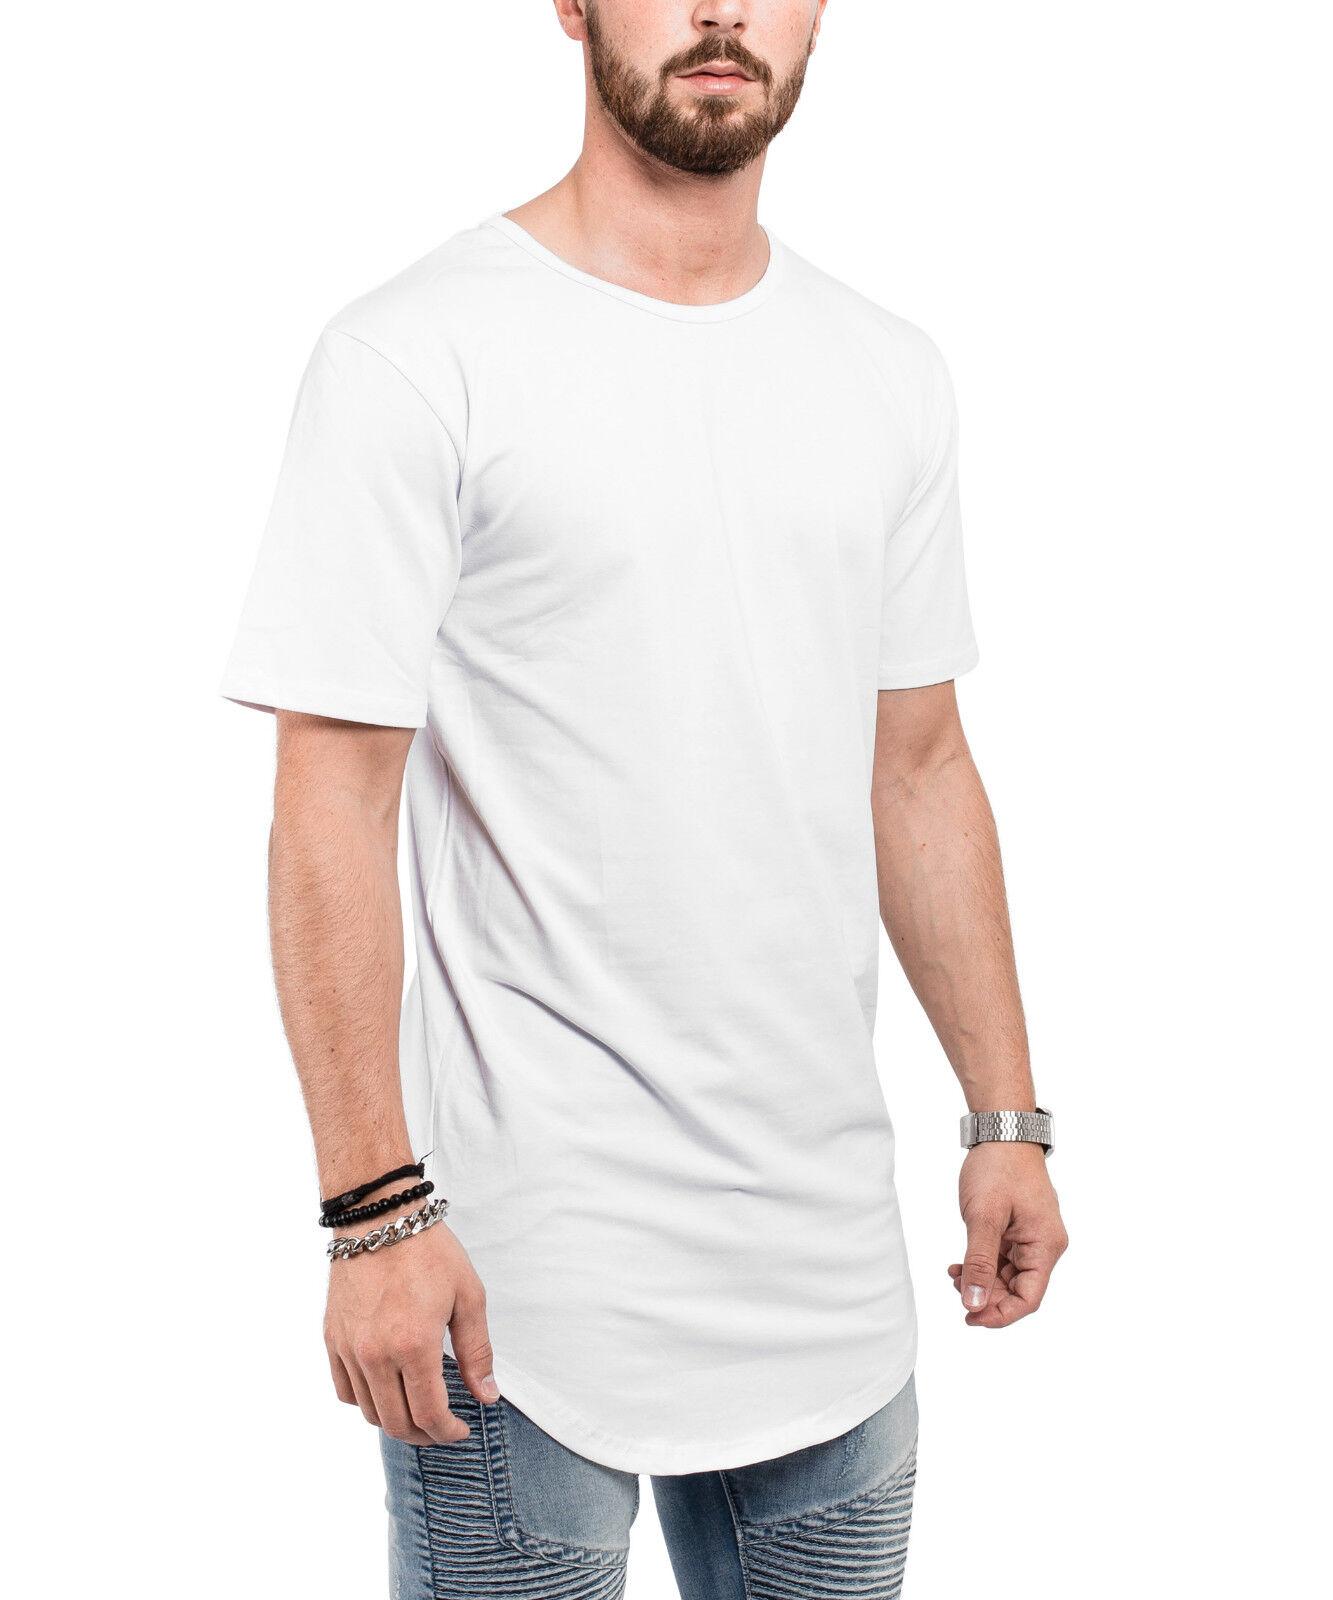 b61110481811 Kleidung & Accessoires Blackskies Round Longshirt T-Shirt Weiß Long Basic  Herren Oversized Longline Tee